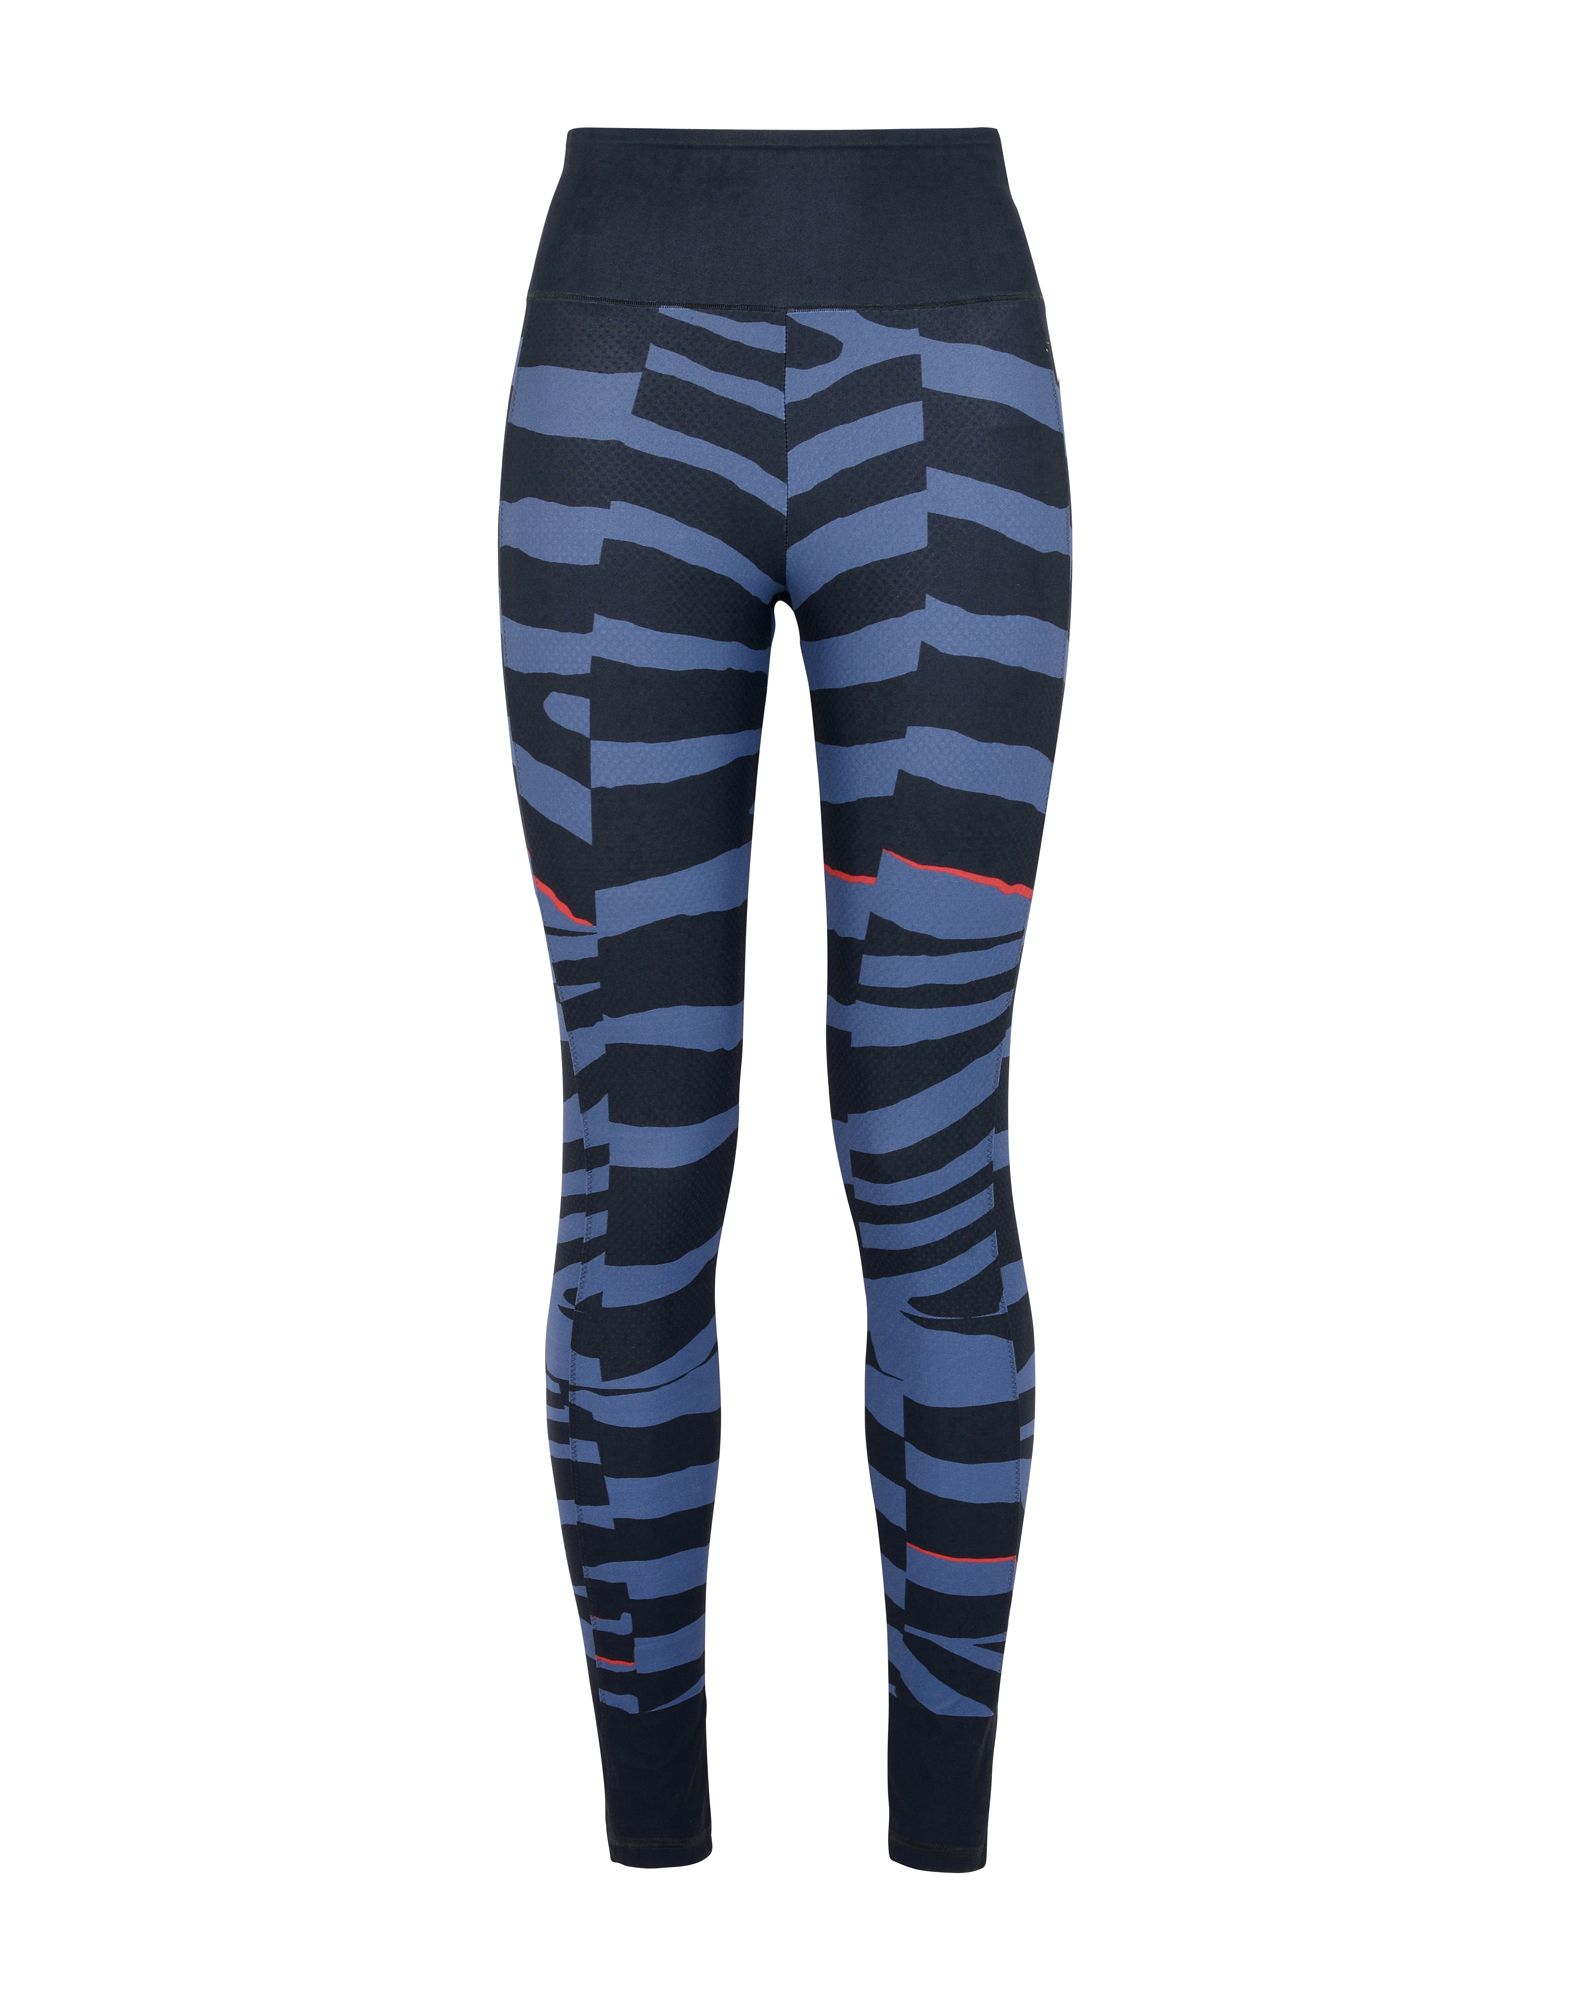 Leggings Adidas By Stella Mccartney Train Miracle Sculpt Cropped Tight Highwaist - Donna - Acquista online su 0Iztzkf